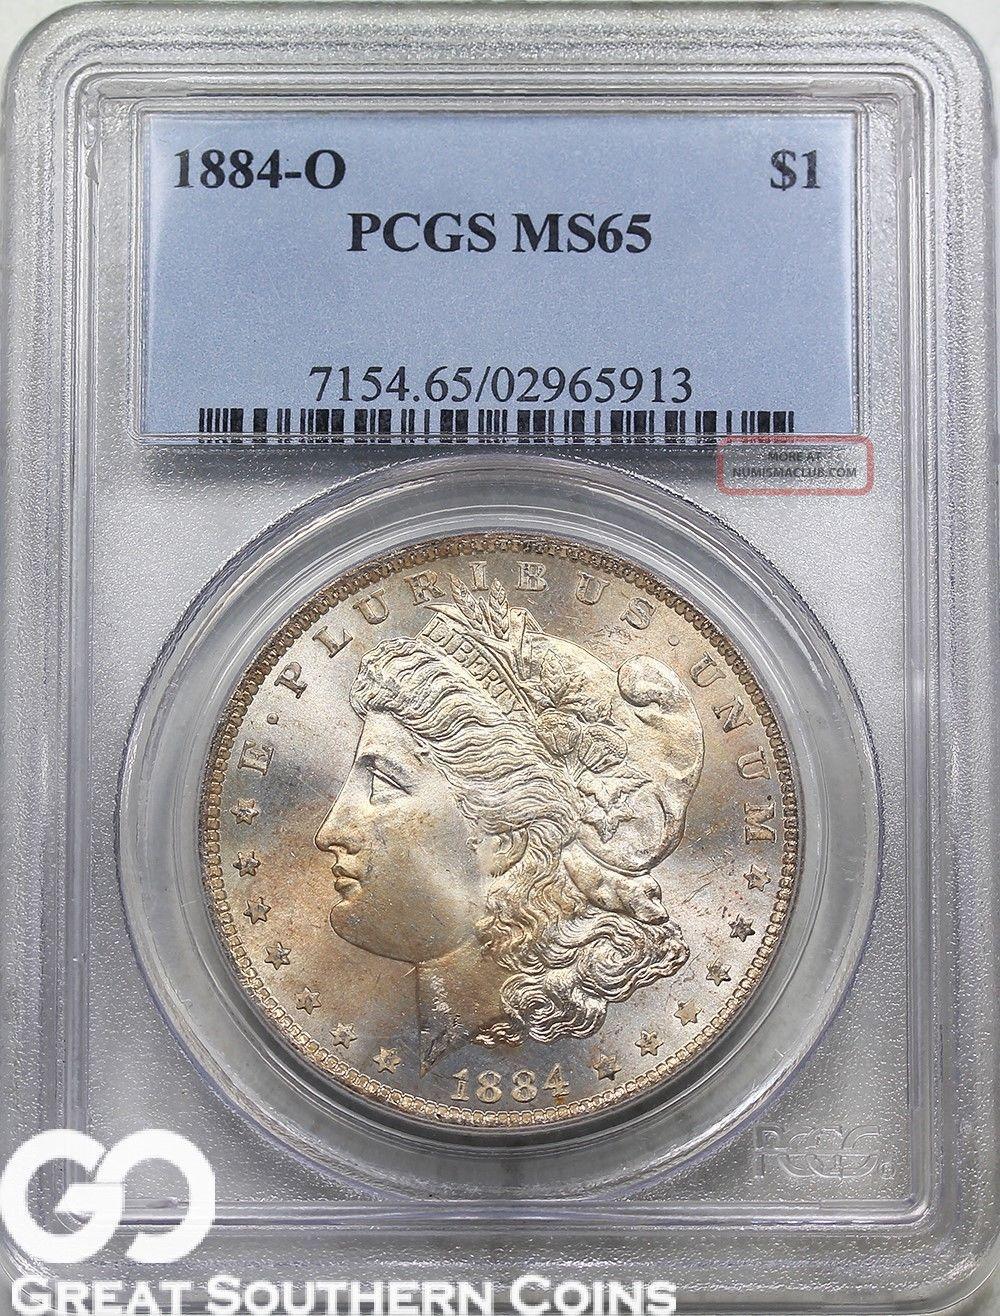 1884 - O Pcgs Morgan Silver Dollar Pcgs Ms 65 Dollars photo